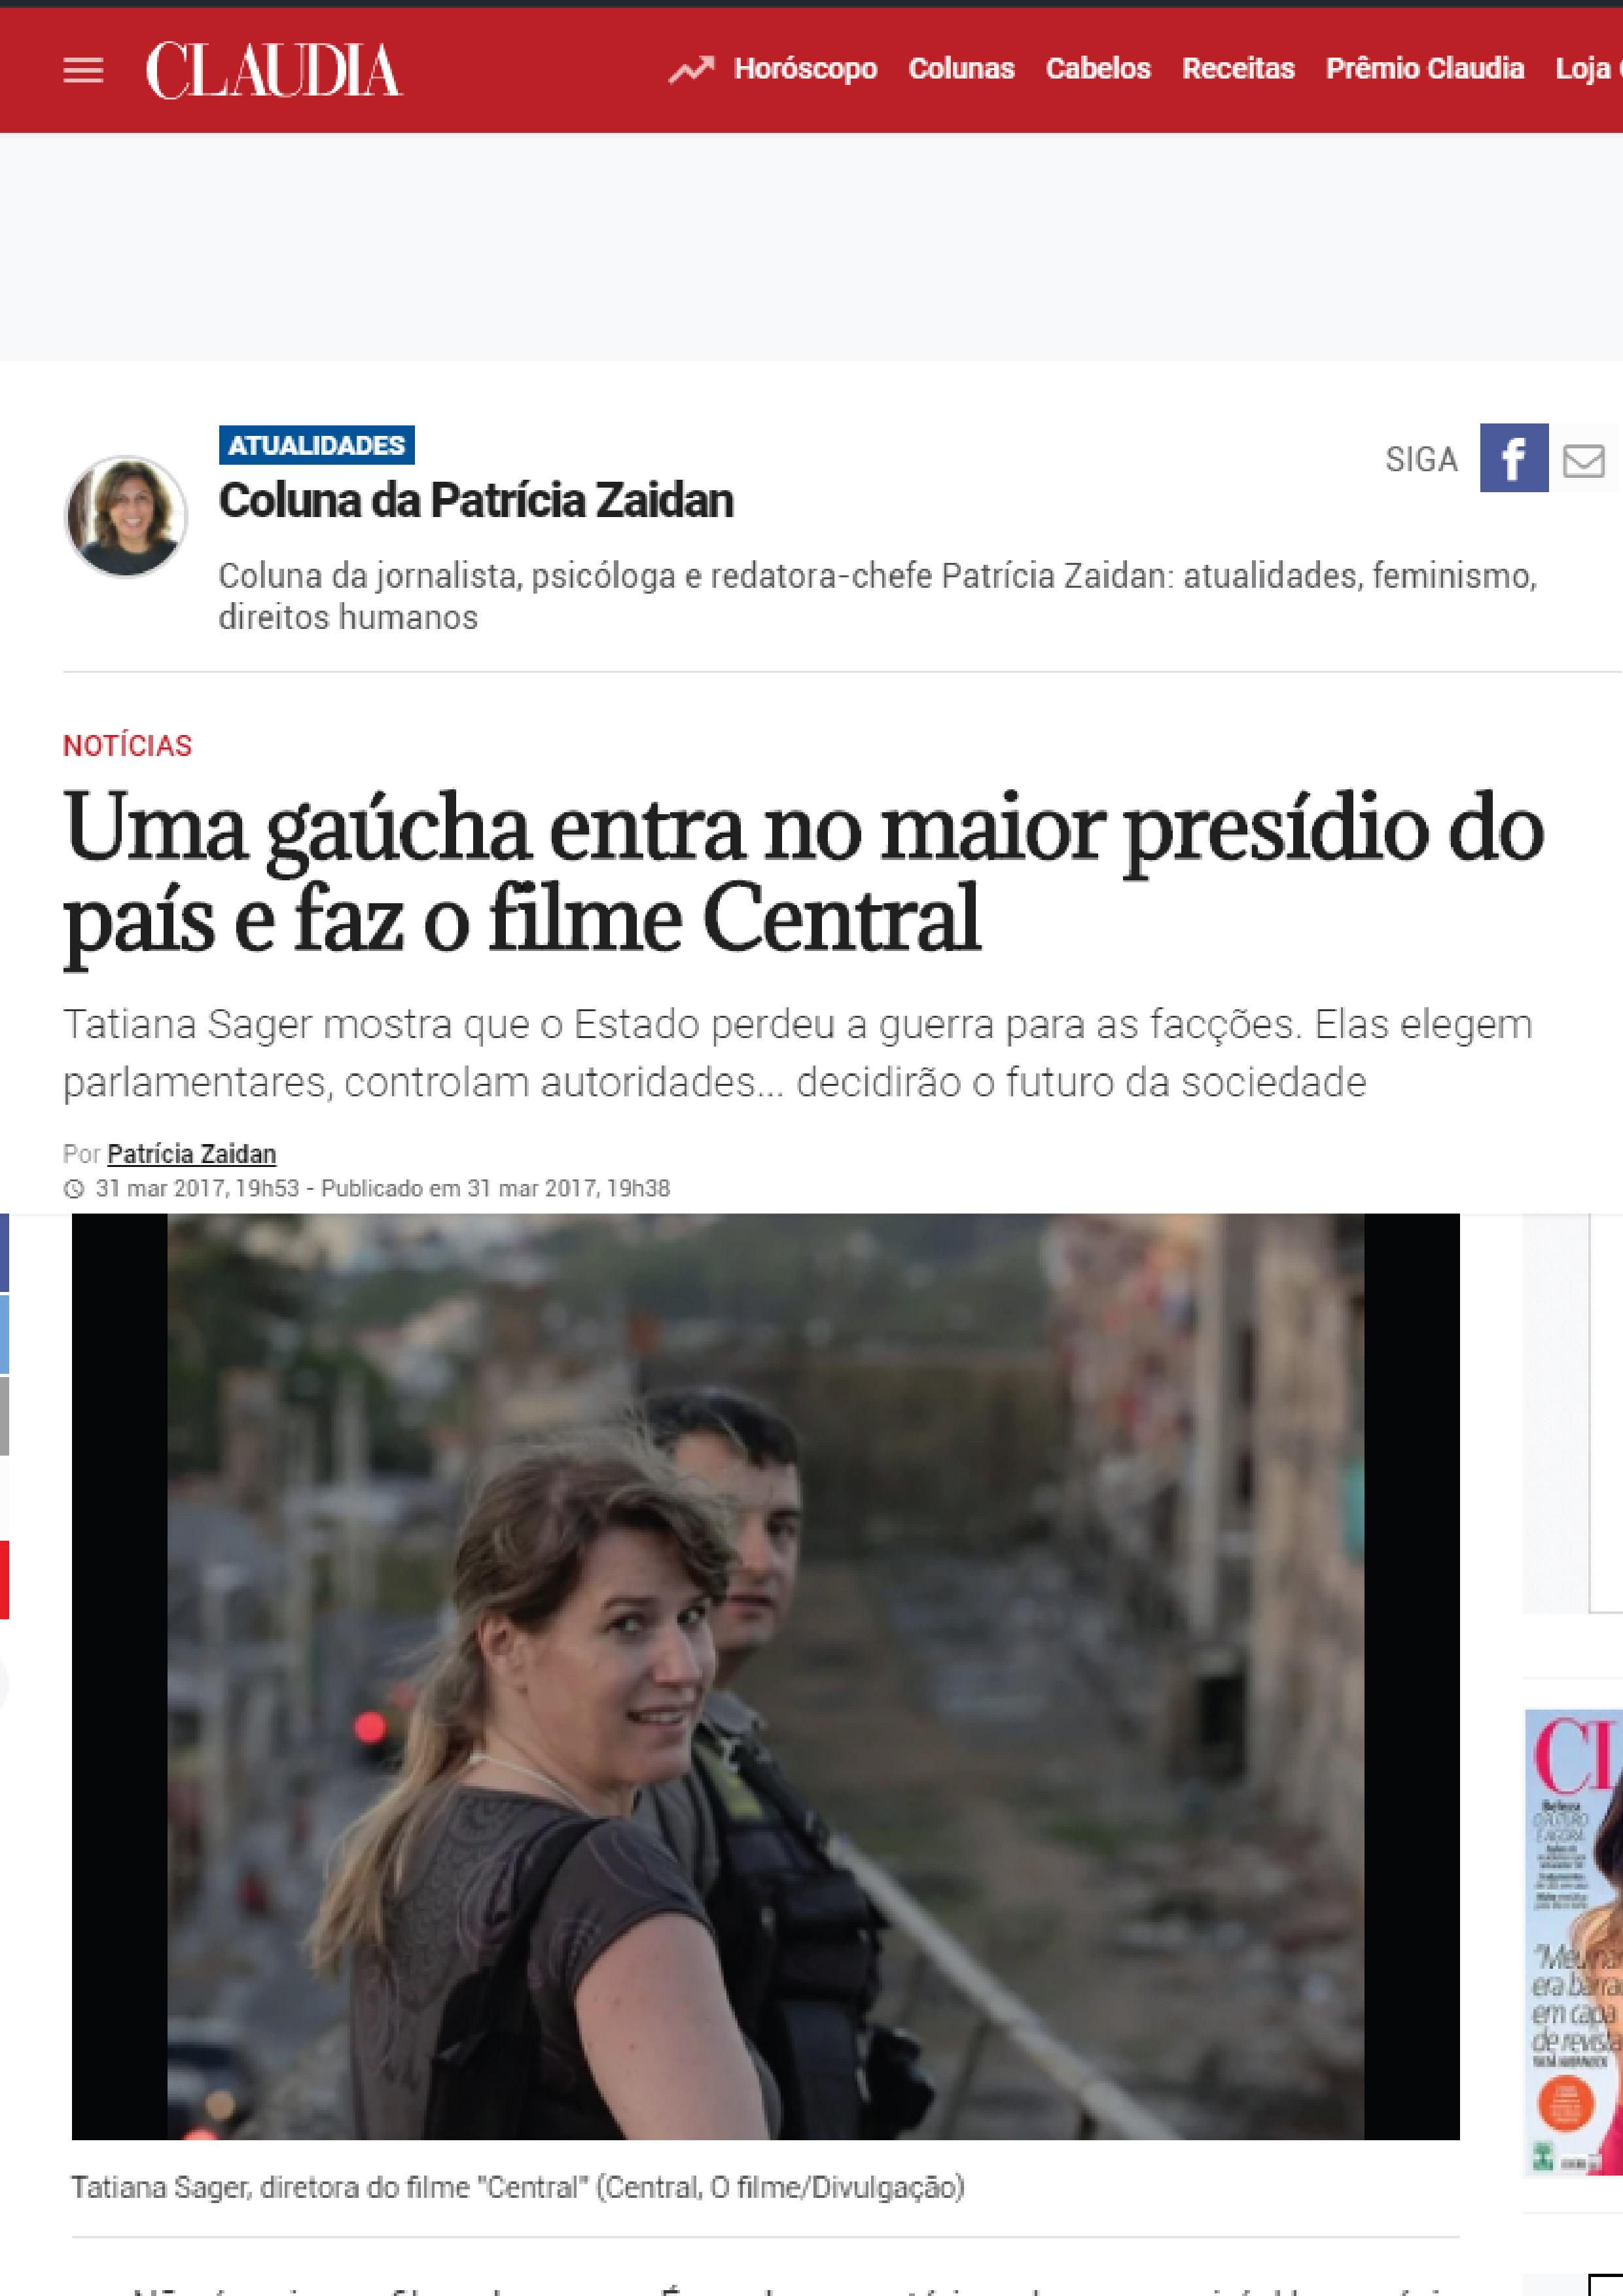 Revista Cláudia | 23.03